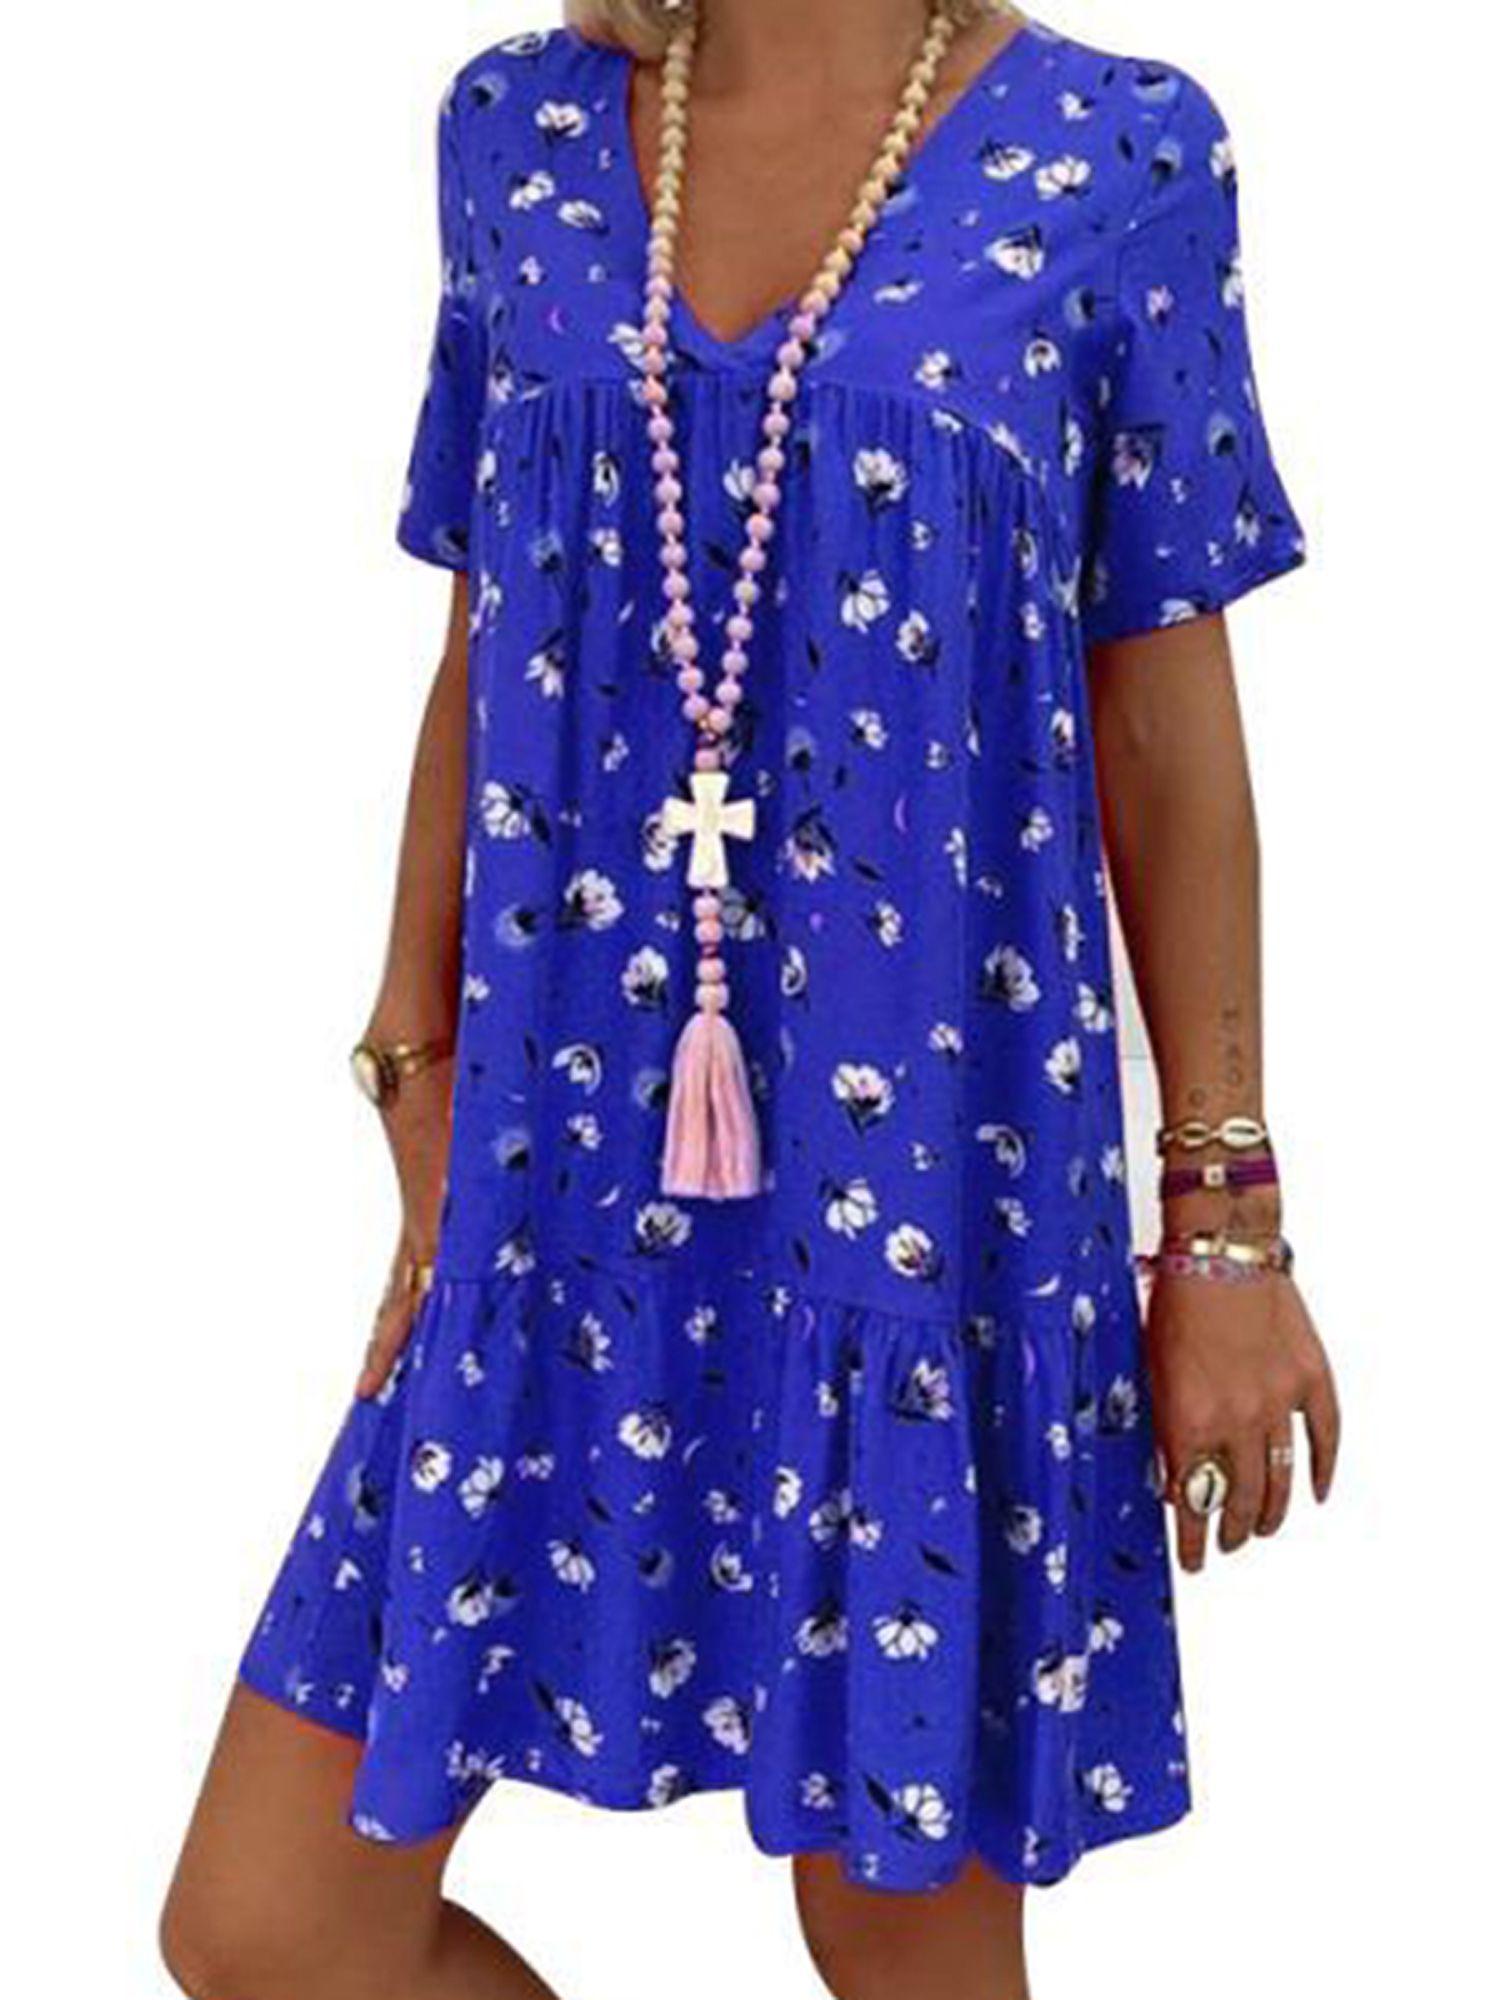 Wodstyle Women S V Neck Floral Short Sleeve Plus Size Loose Boho Mini Dress Plus Size Mini Dresses Boho Mini Dress Floral Print Shorts [ 2000 x 1500 Pixel ]